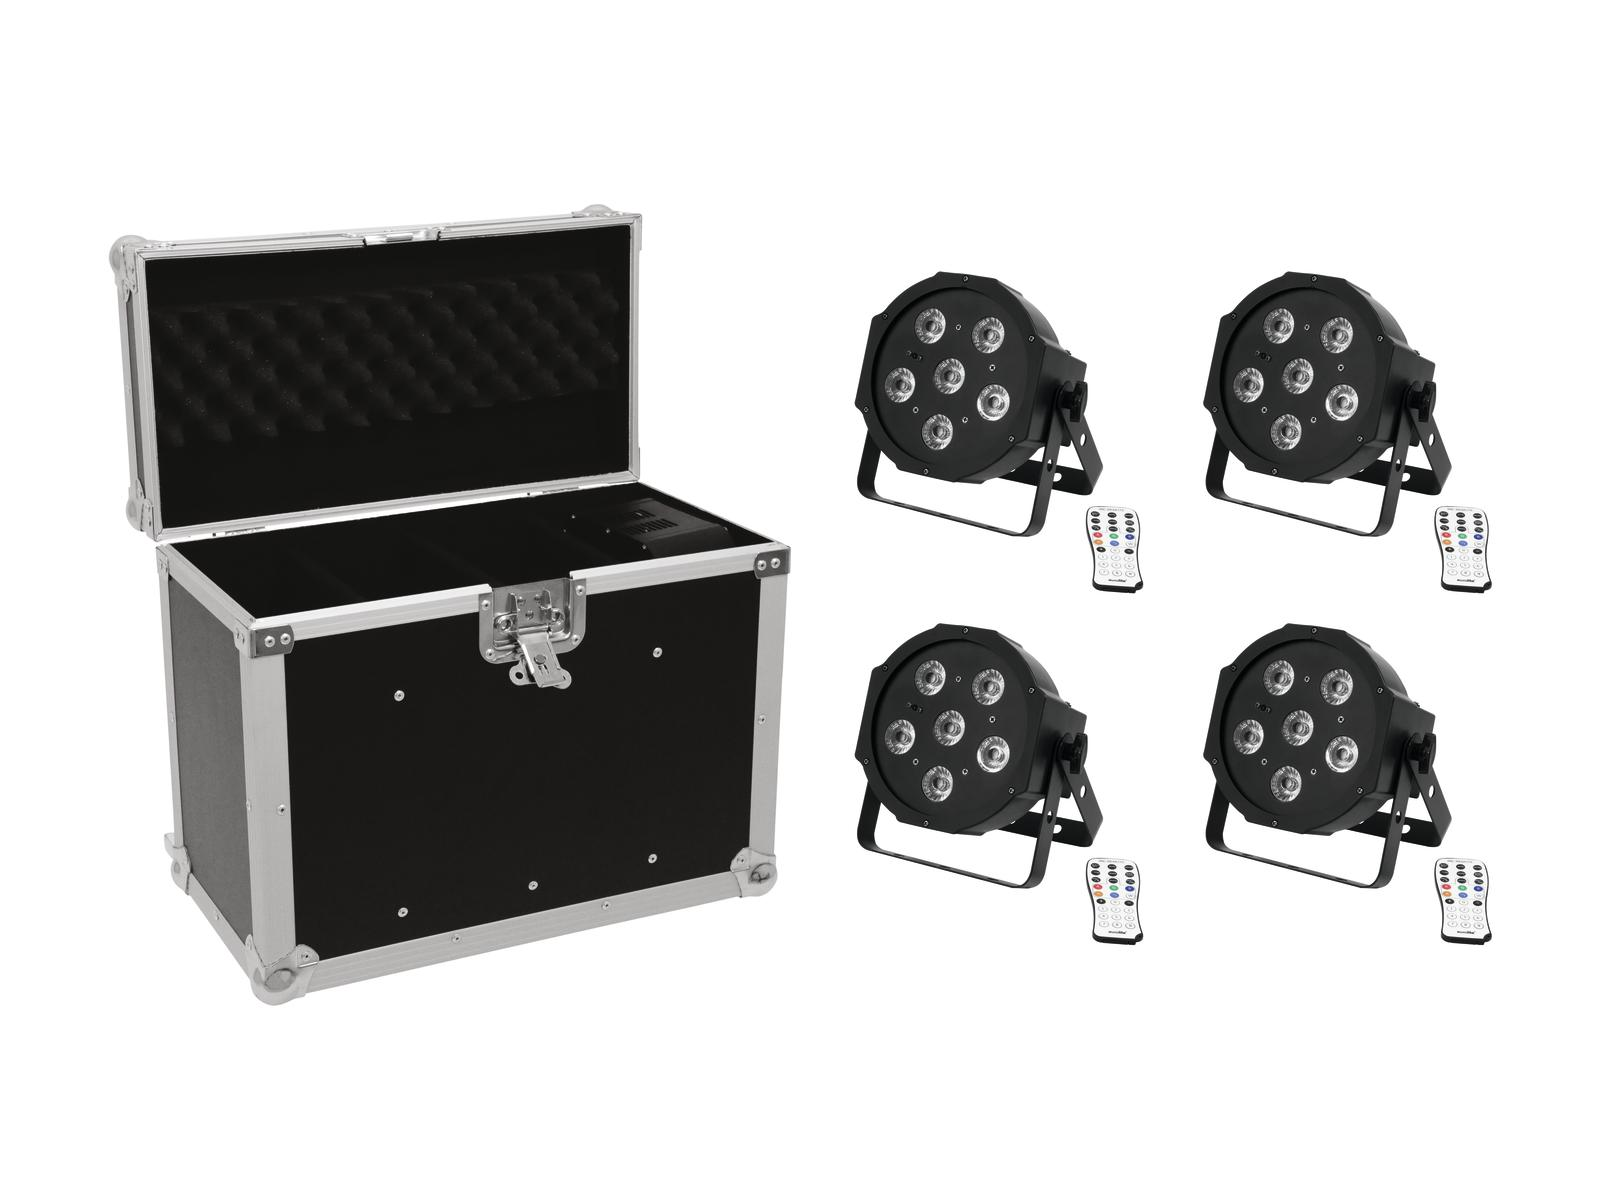 eurolite-set-4x-led-sls-603-case-ec-sl4m-gra-aye-m